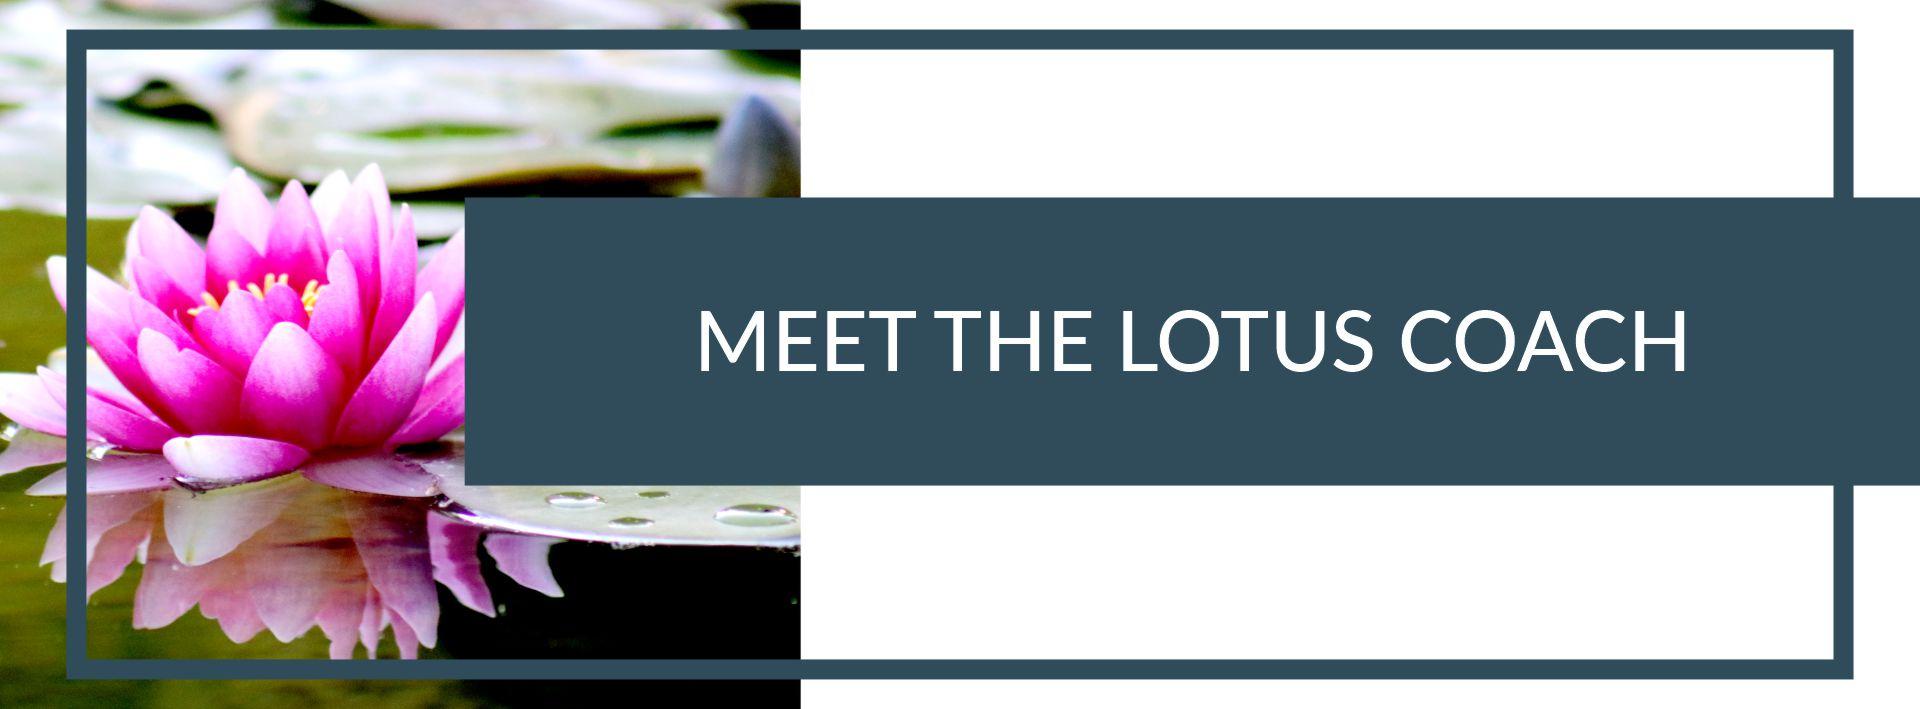 Meet the Lotus Coach